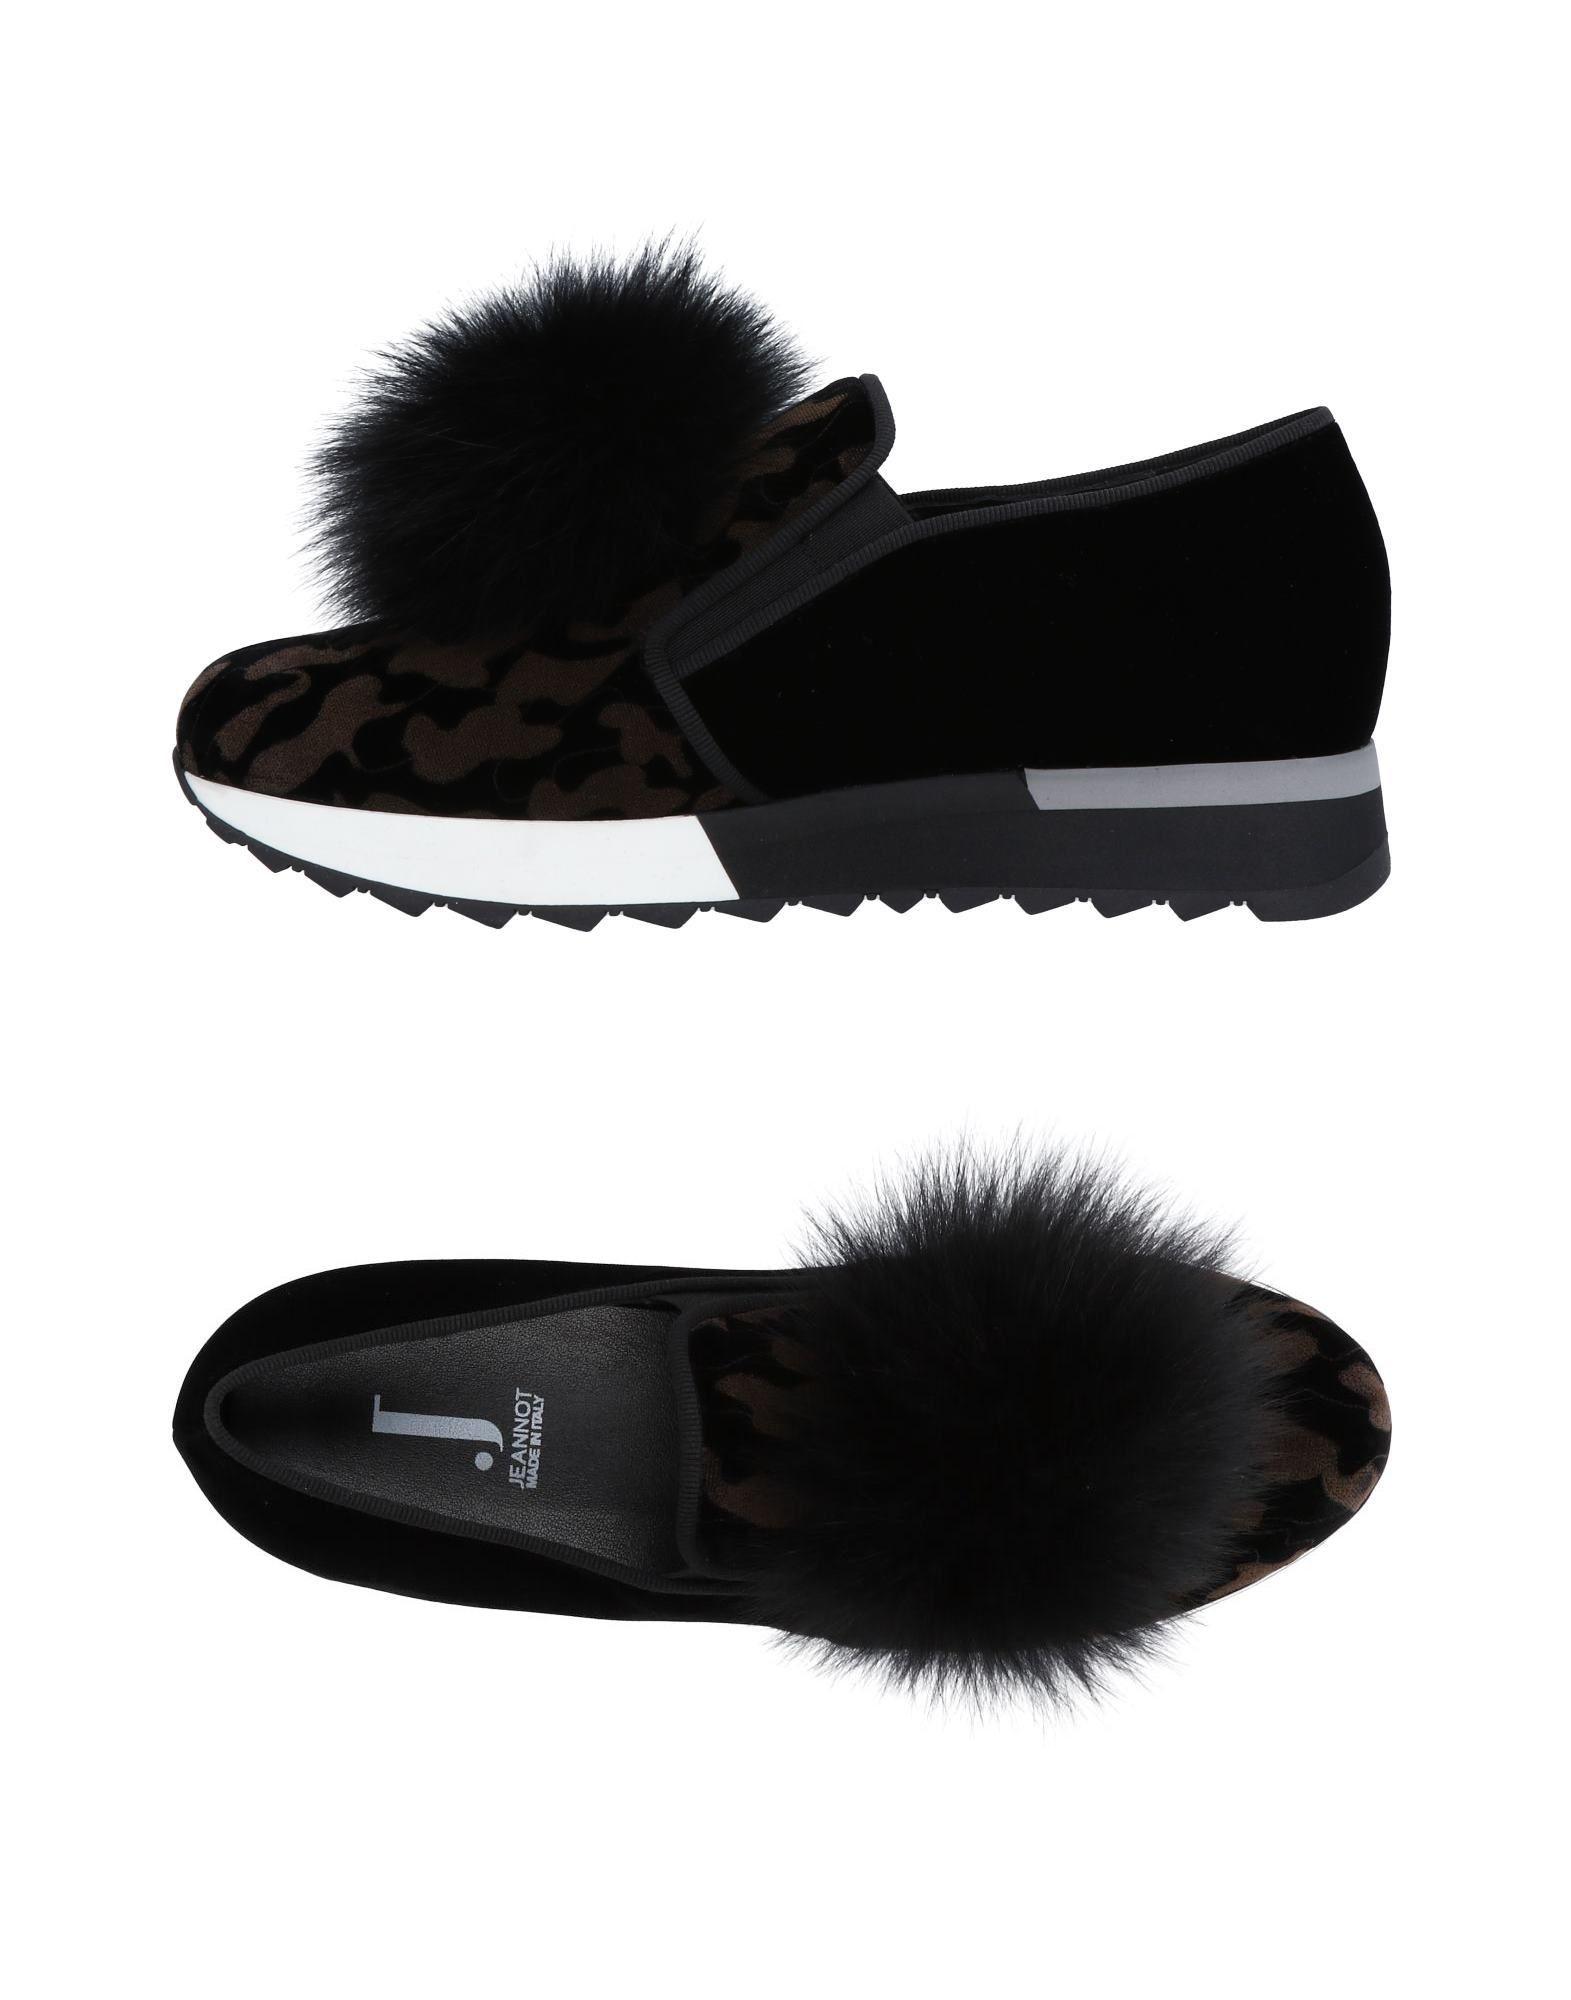 Moda 11492618KQ Sneakers Jeannot Donna - 11492618KQ Moda 0d10d9